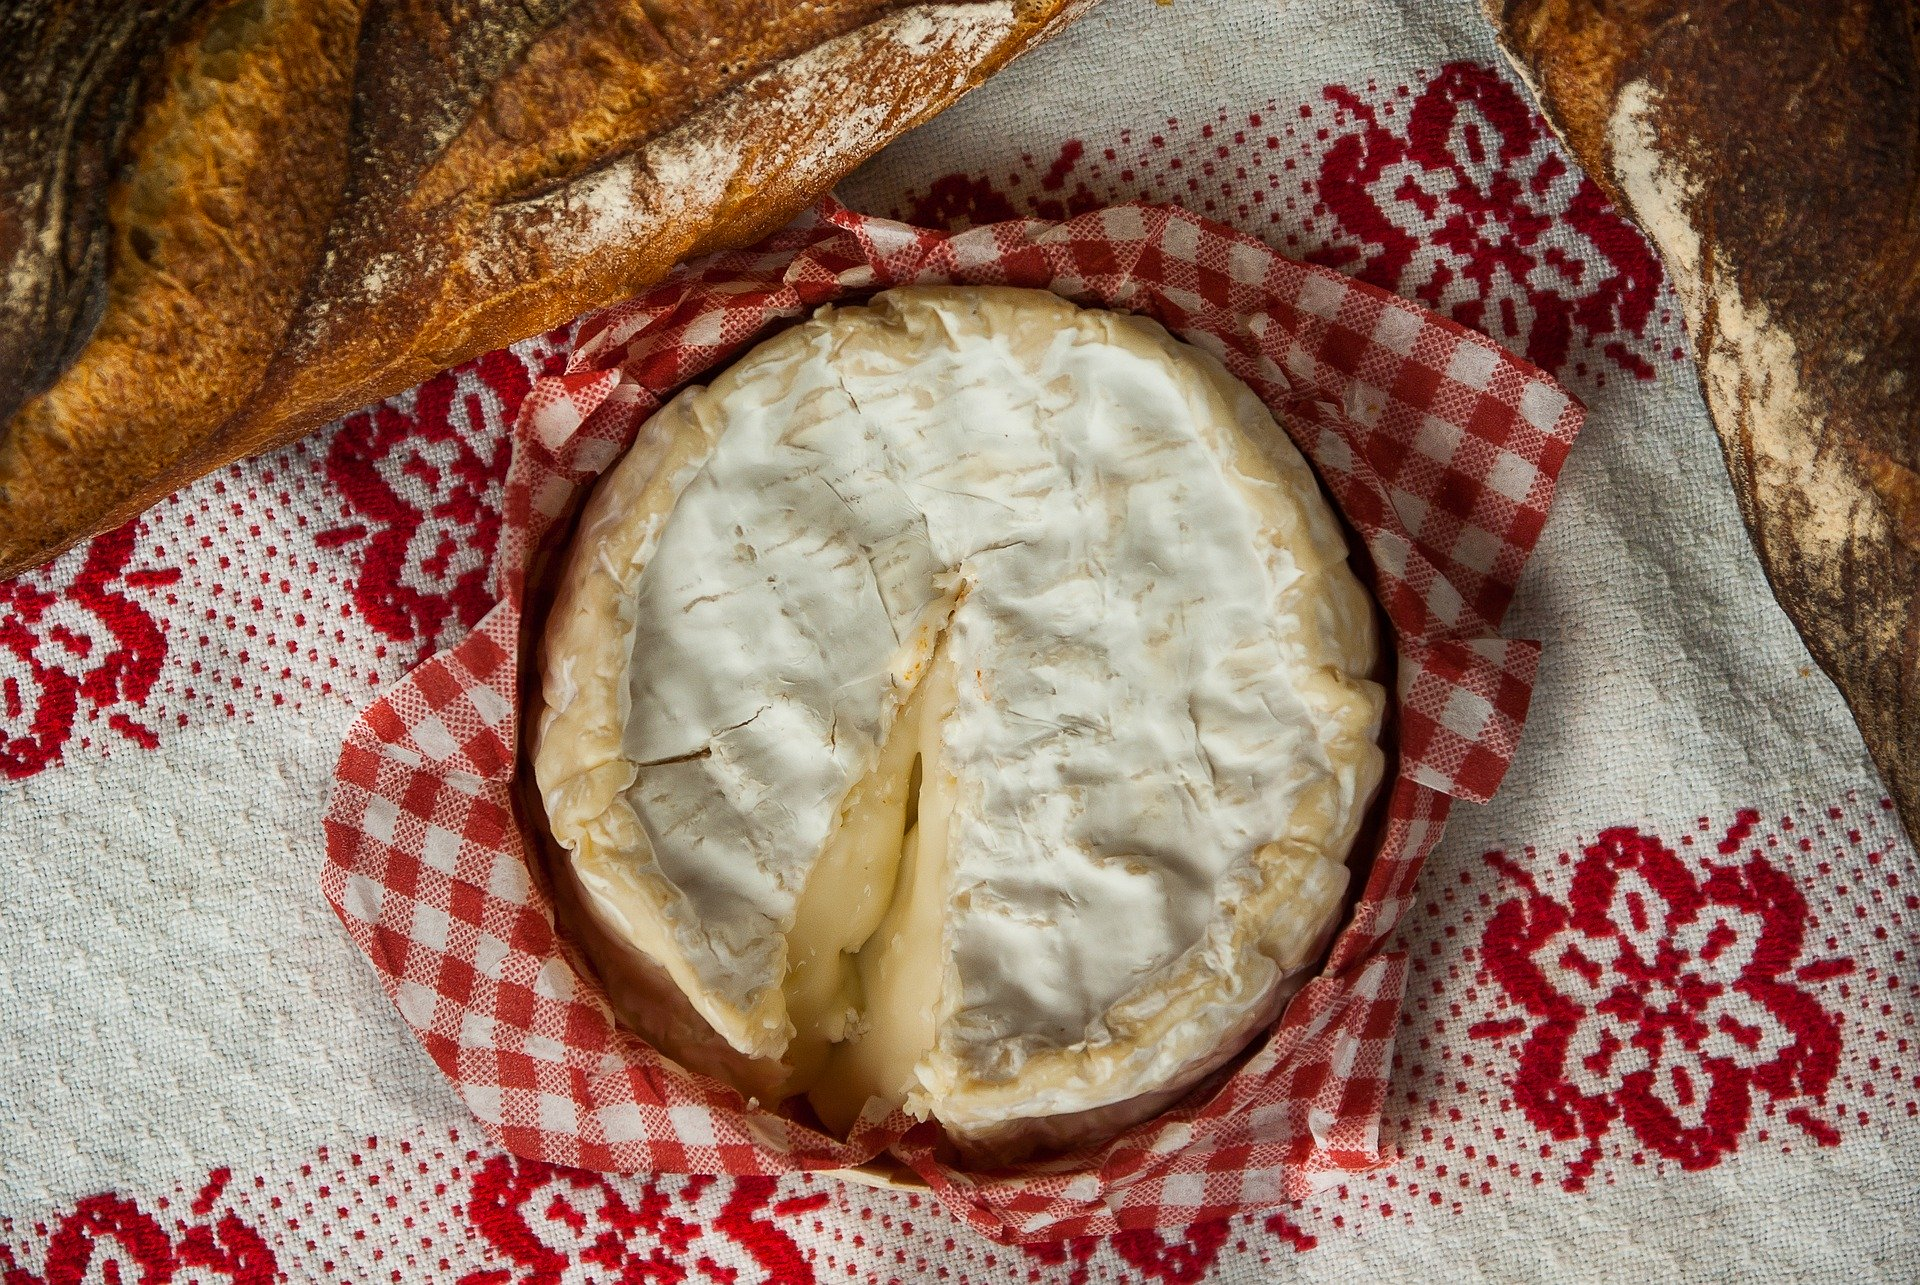 Camembert of Normandy